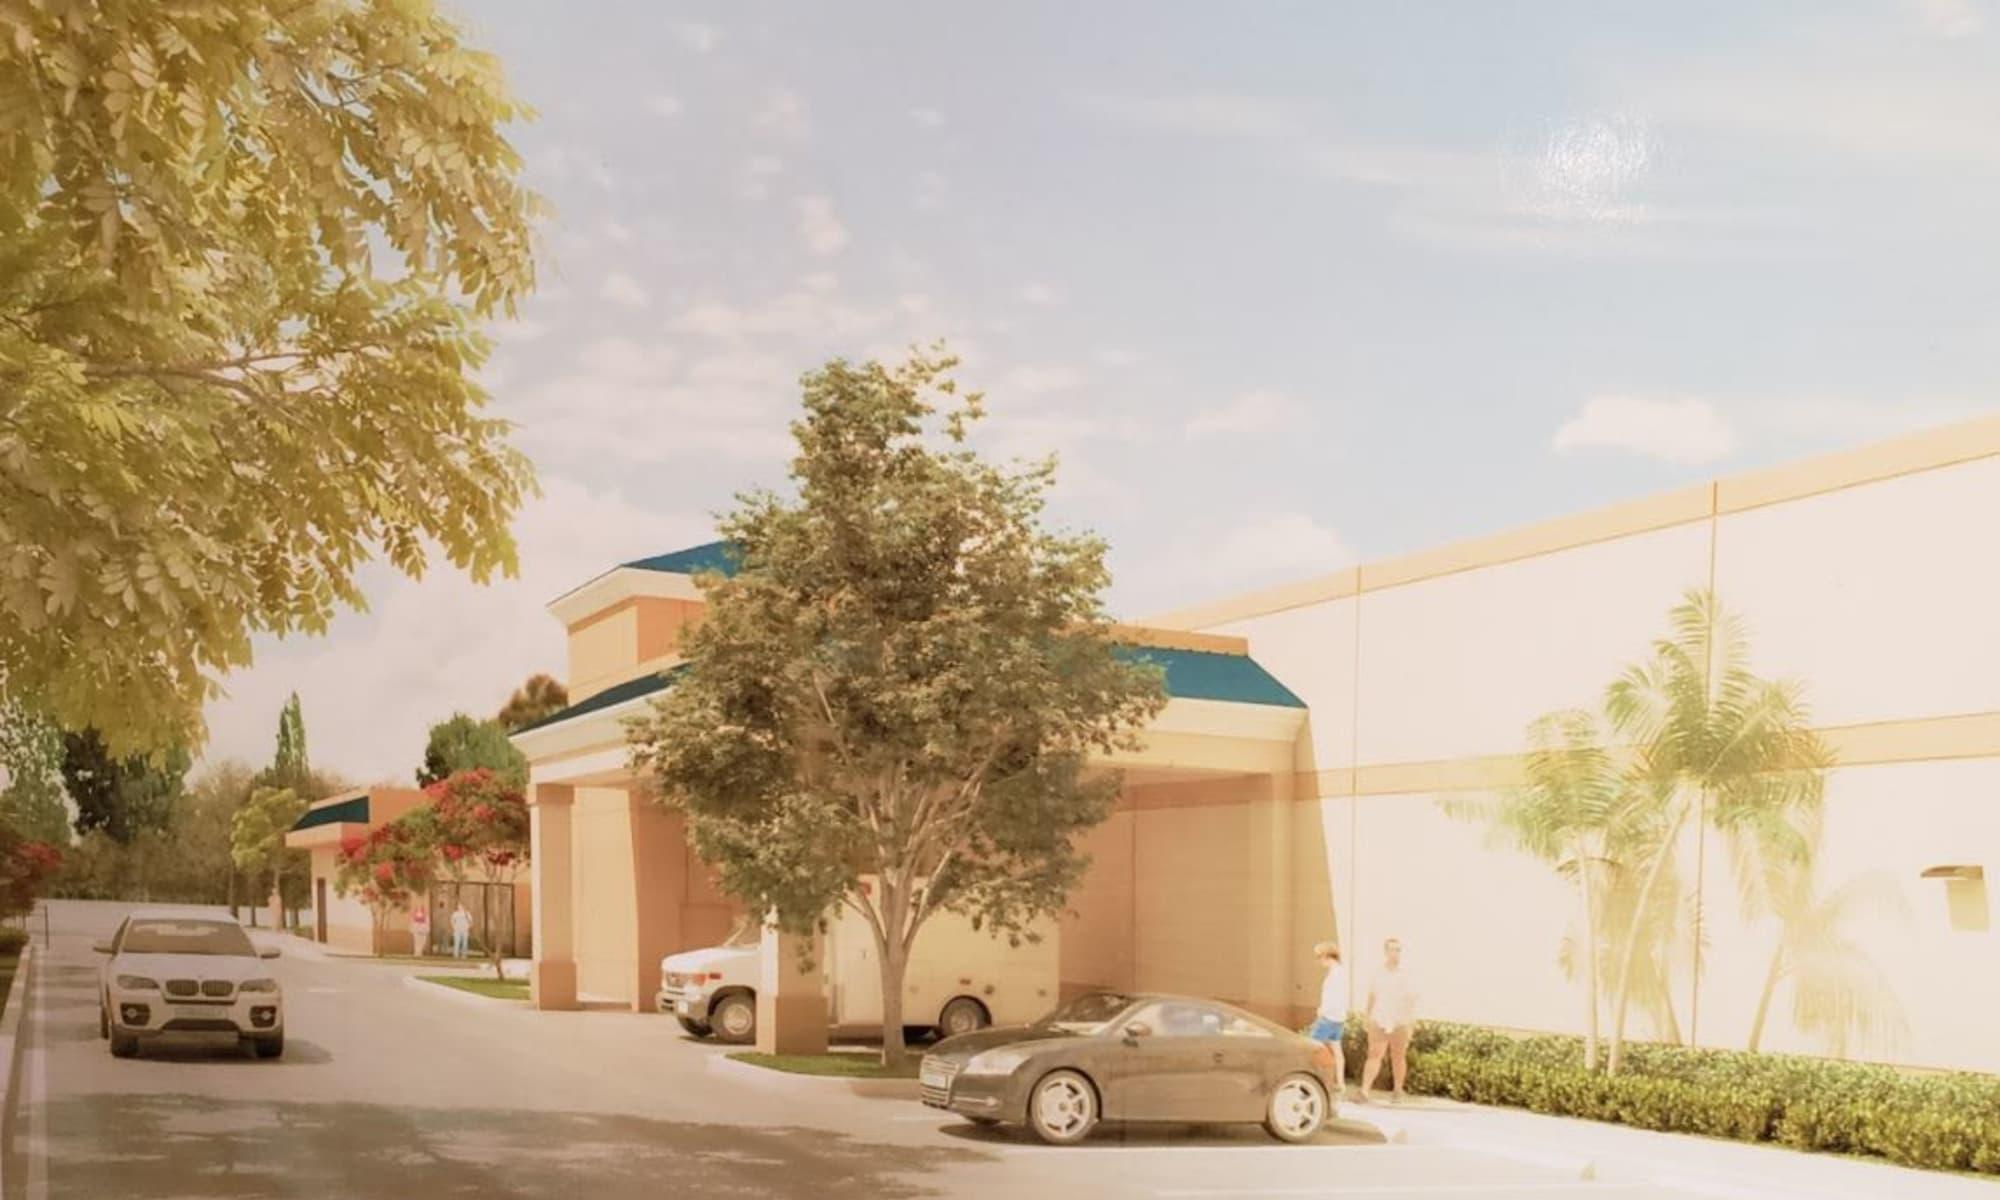 Parking lot at West Palm Beach, Florida near Top Self Storage